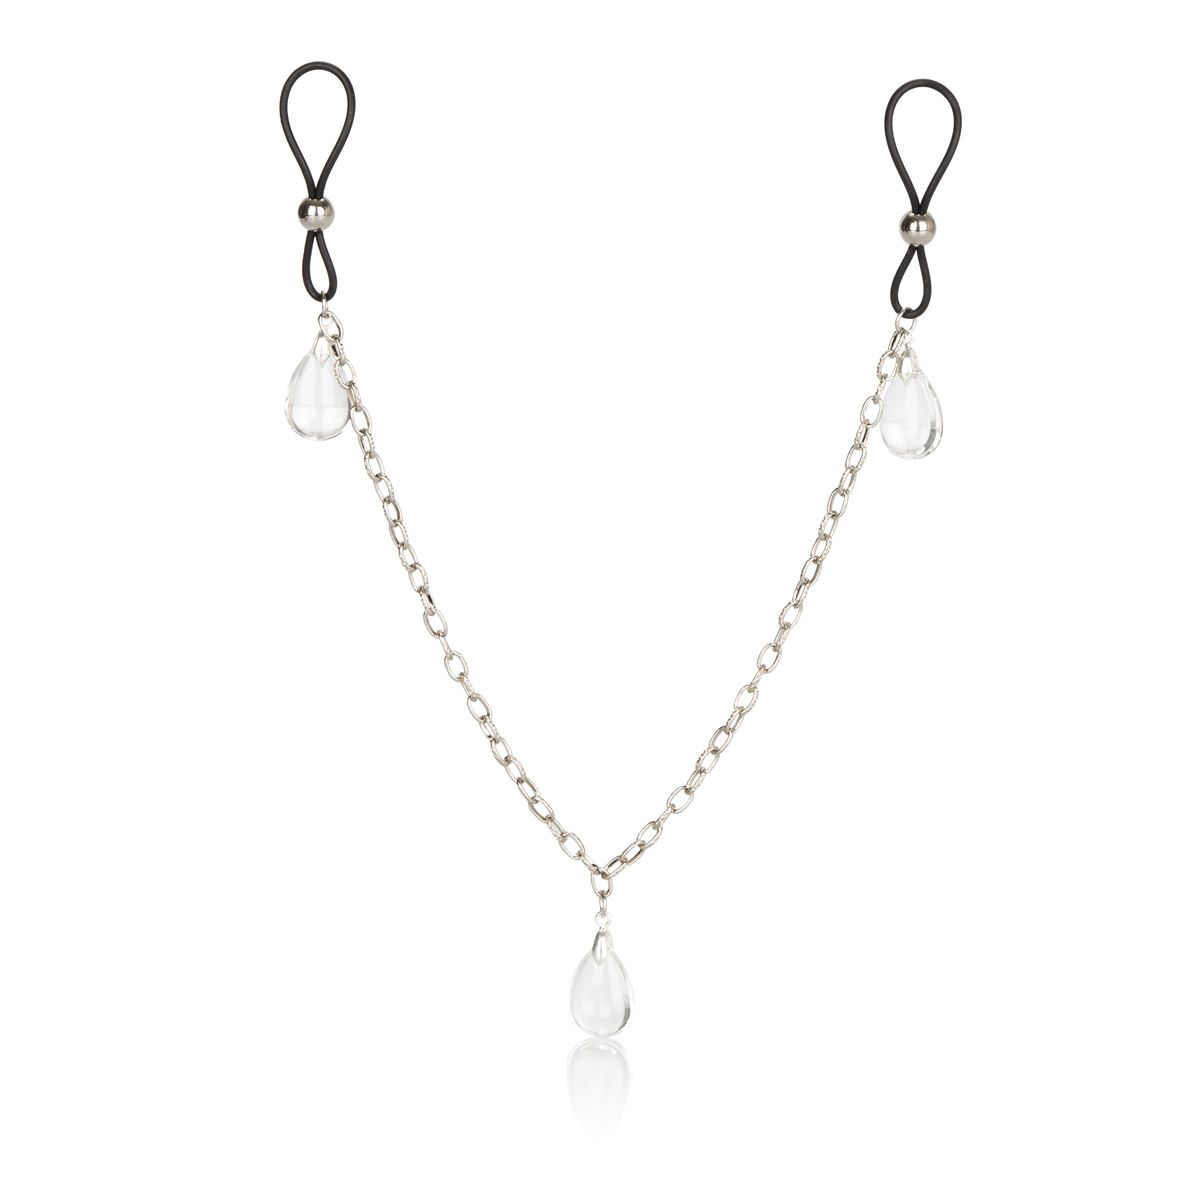 Зажимы на соски Non-Piercing Nipple Chain Jewelry - фото 195238